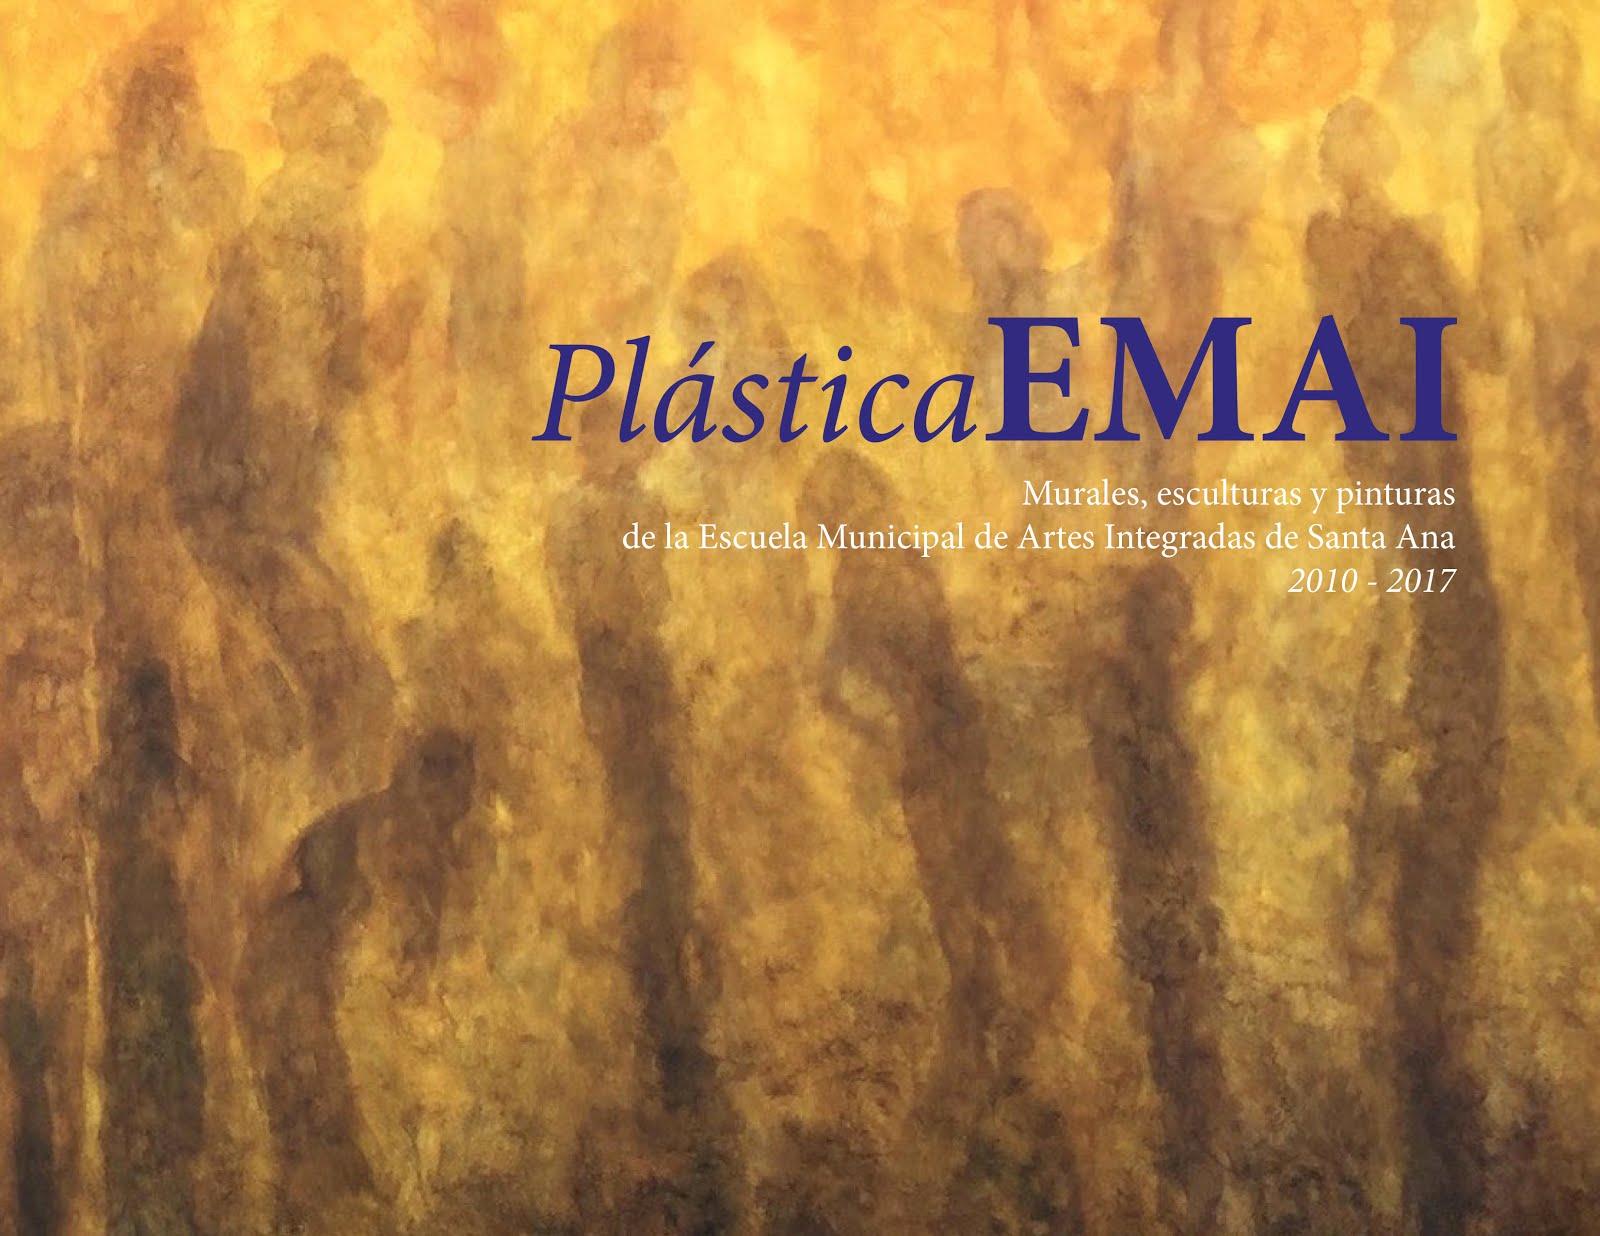 Plástica EMAI